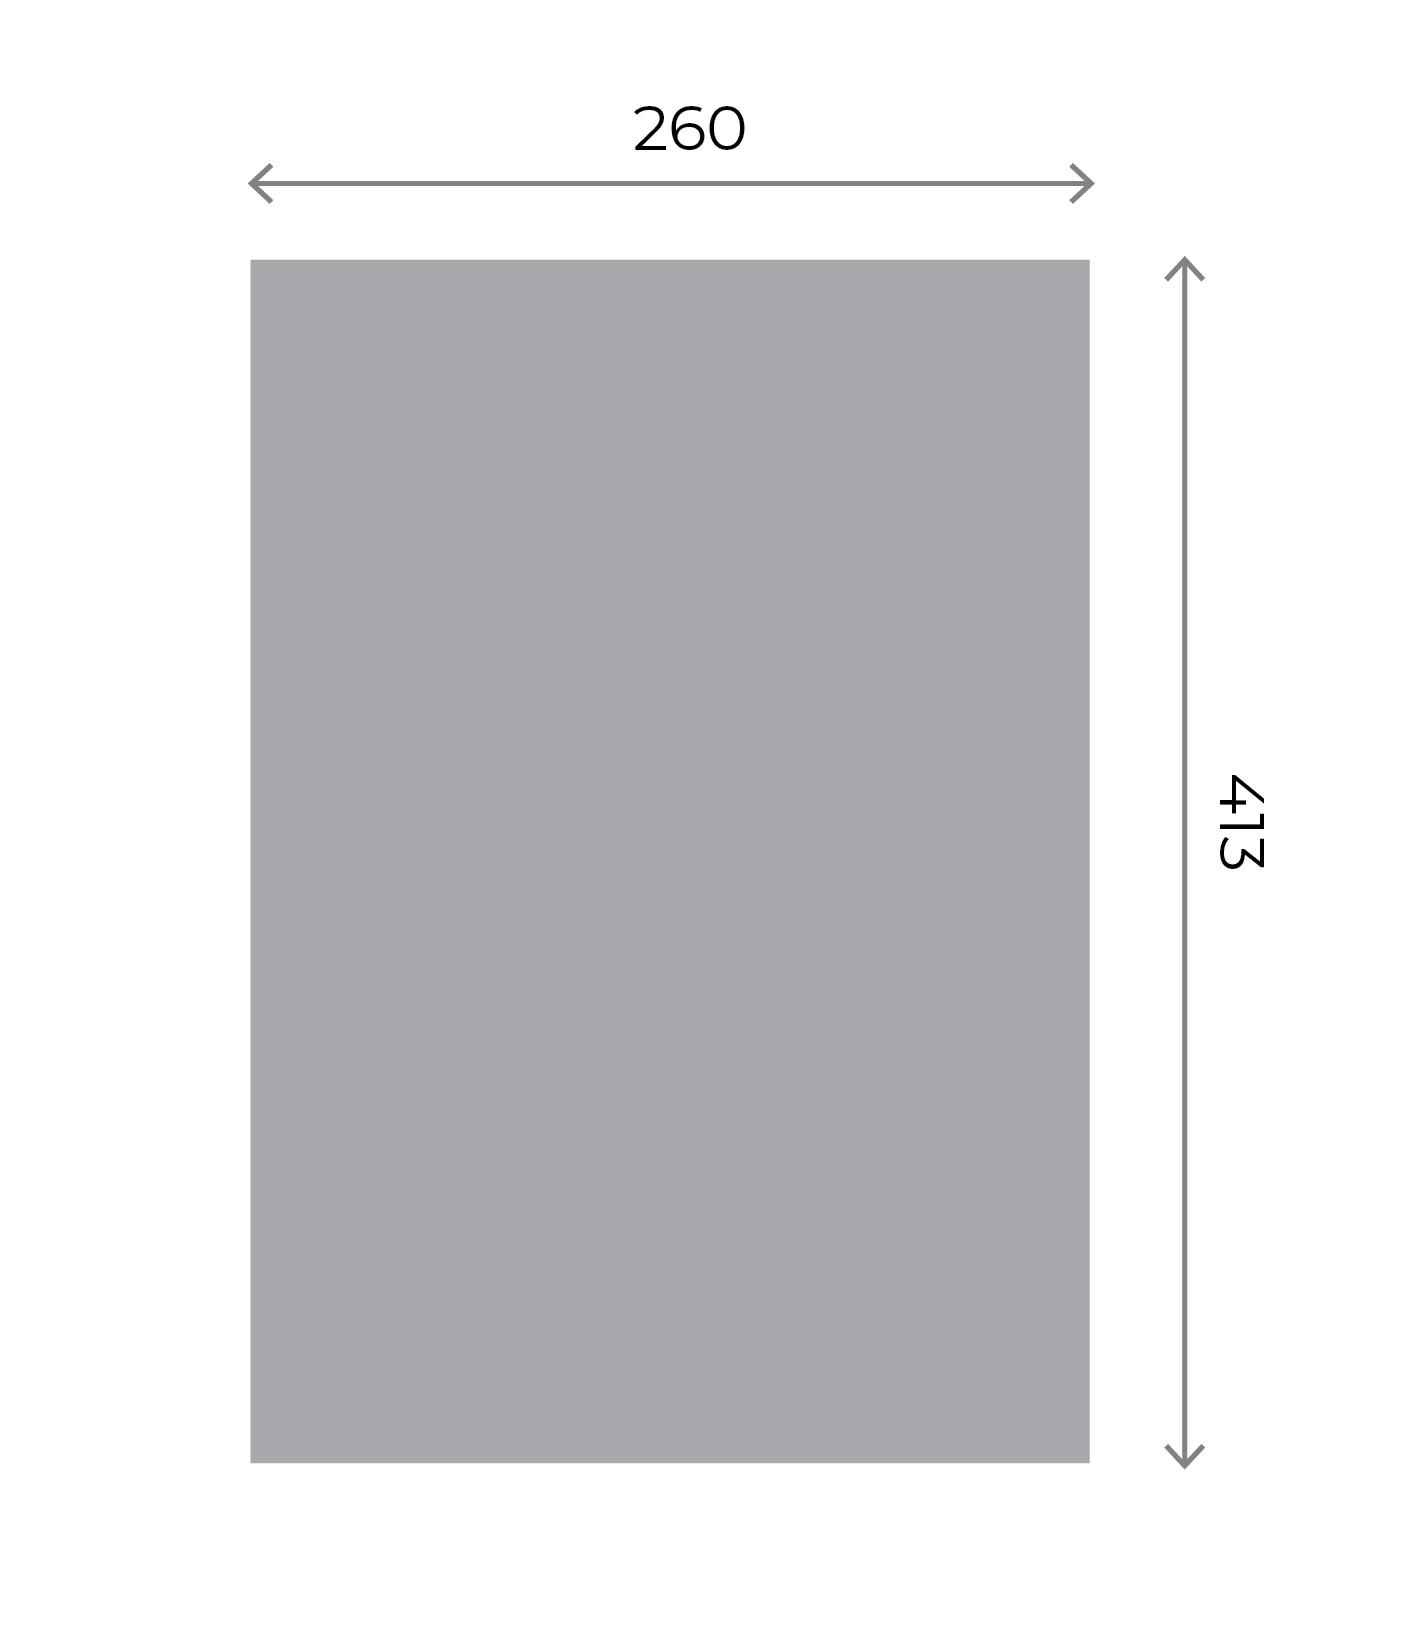 Any Shape Stickers - Large Kiss-cut sheet (260x413mm) 260x413mm 01 Image